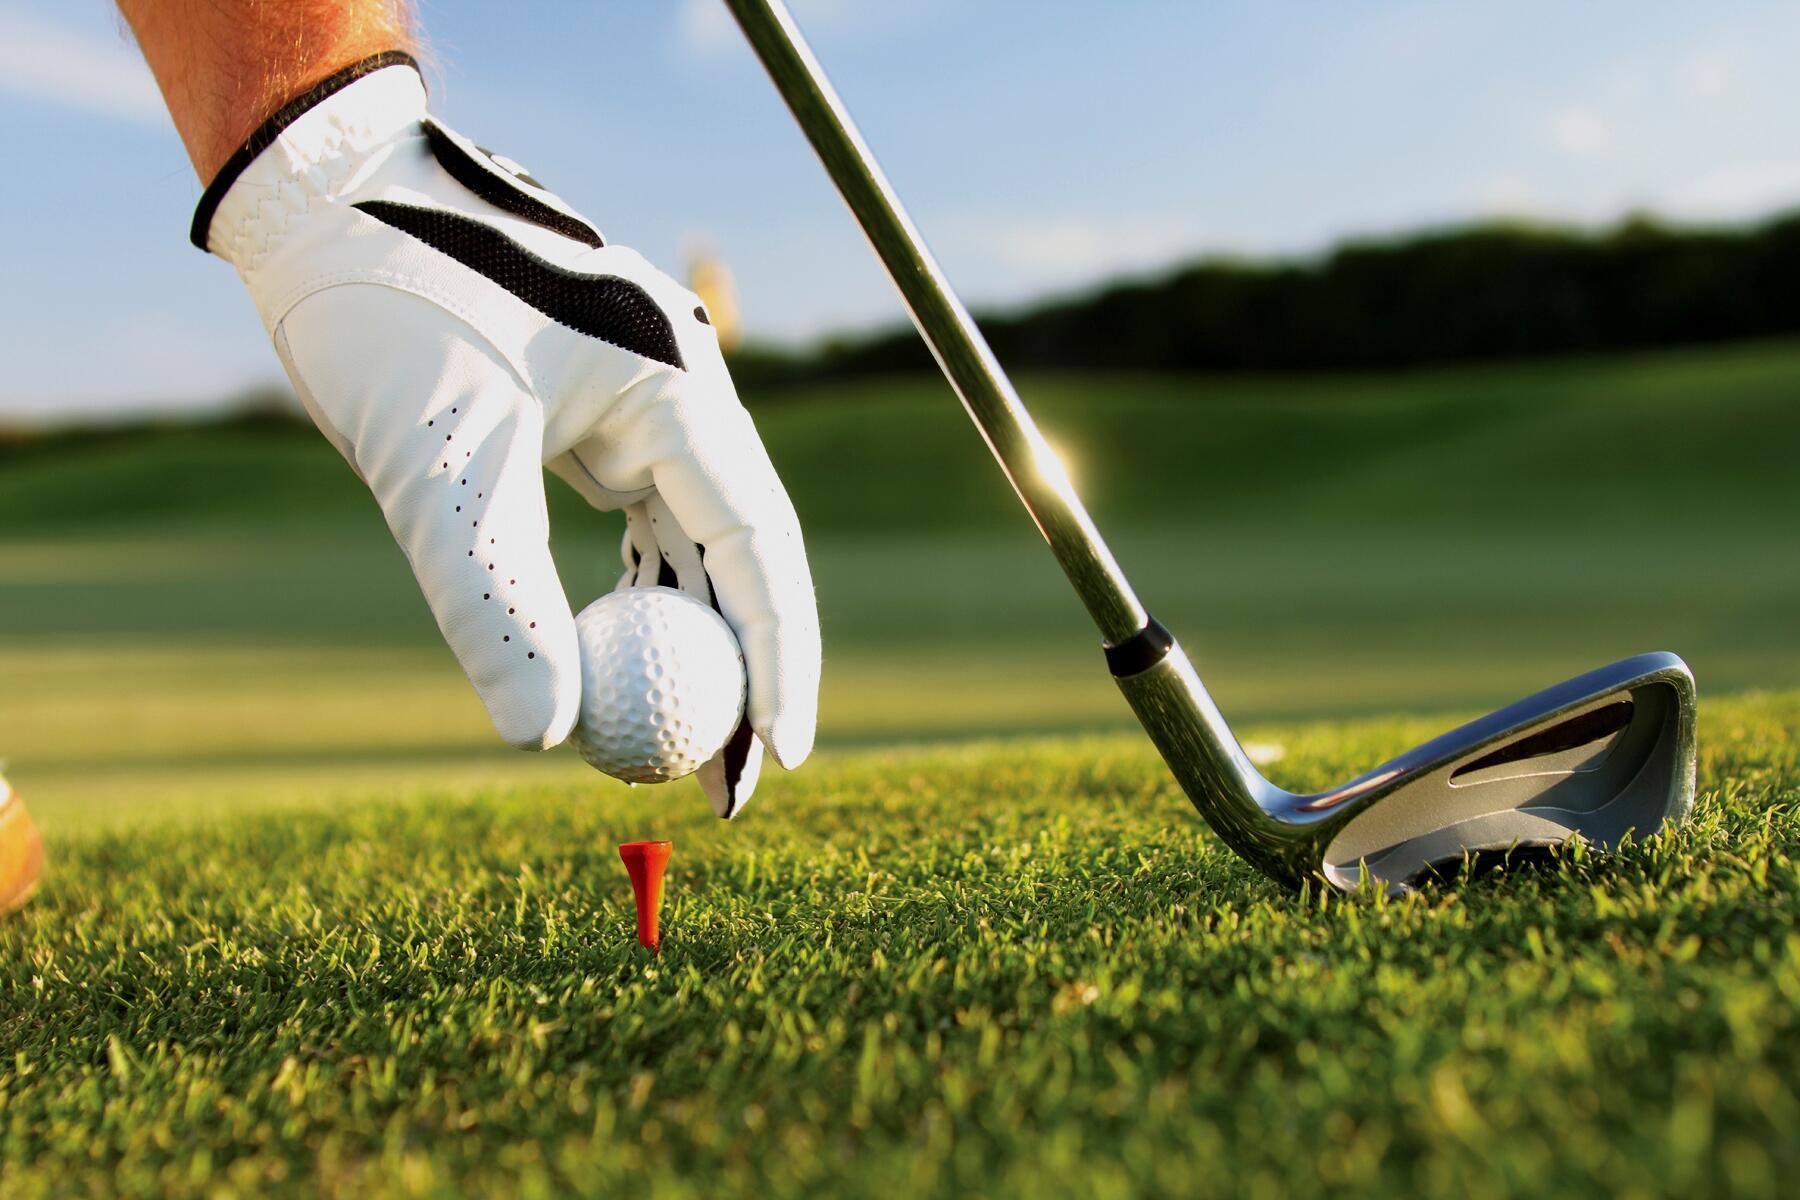 Gloved hand teeing a golf ball.